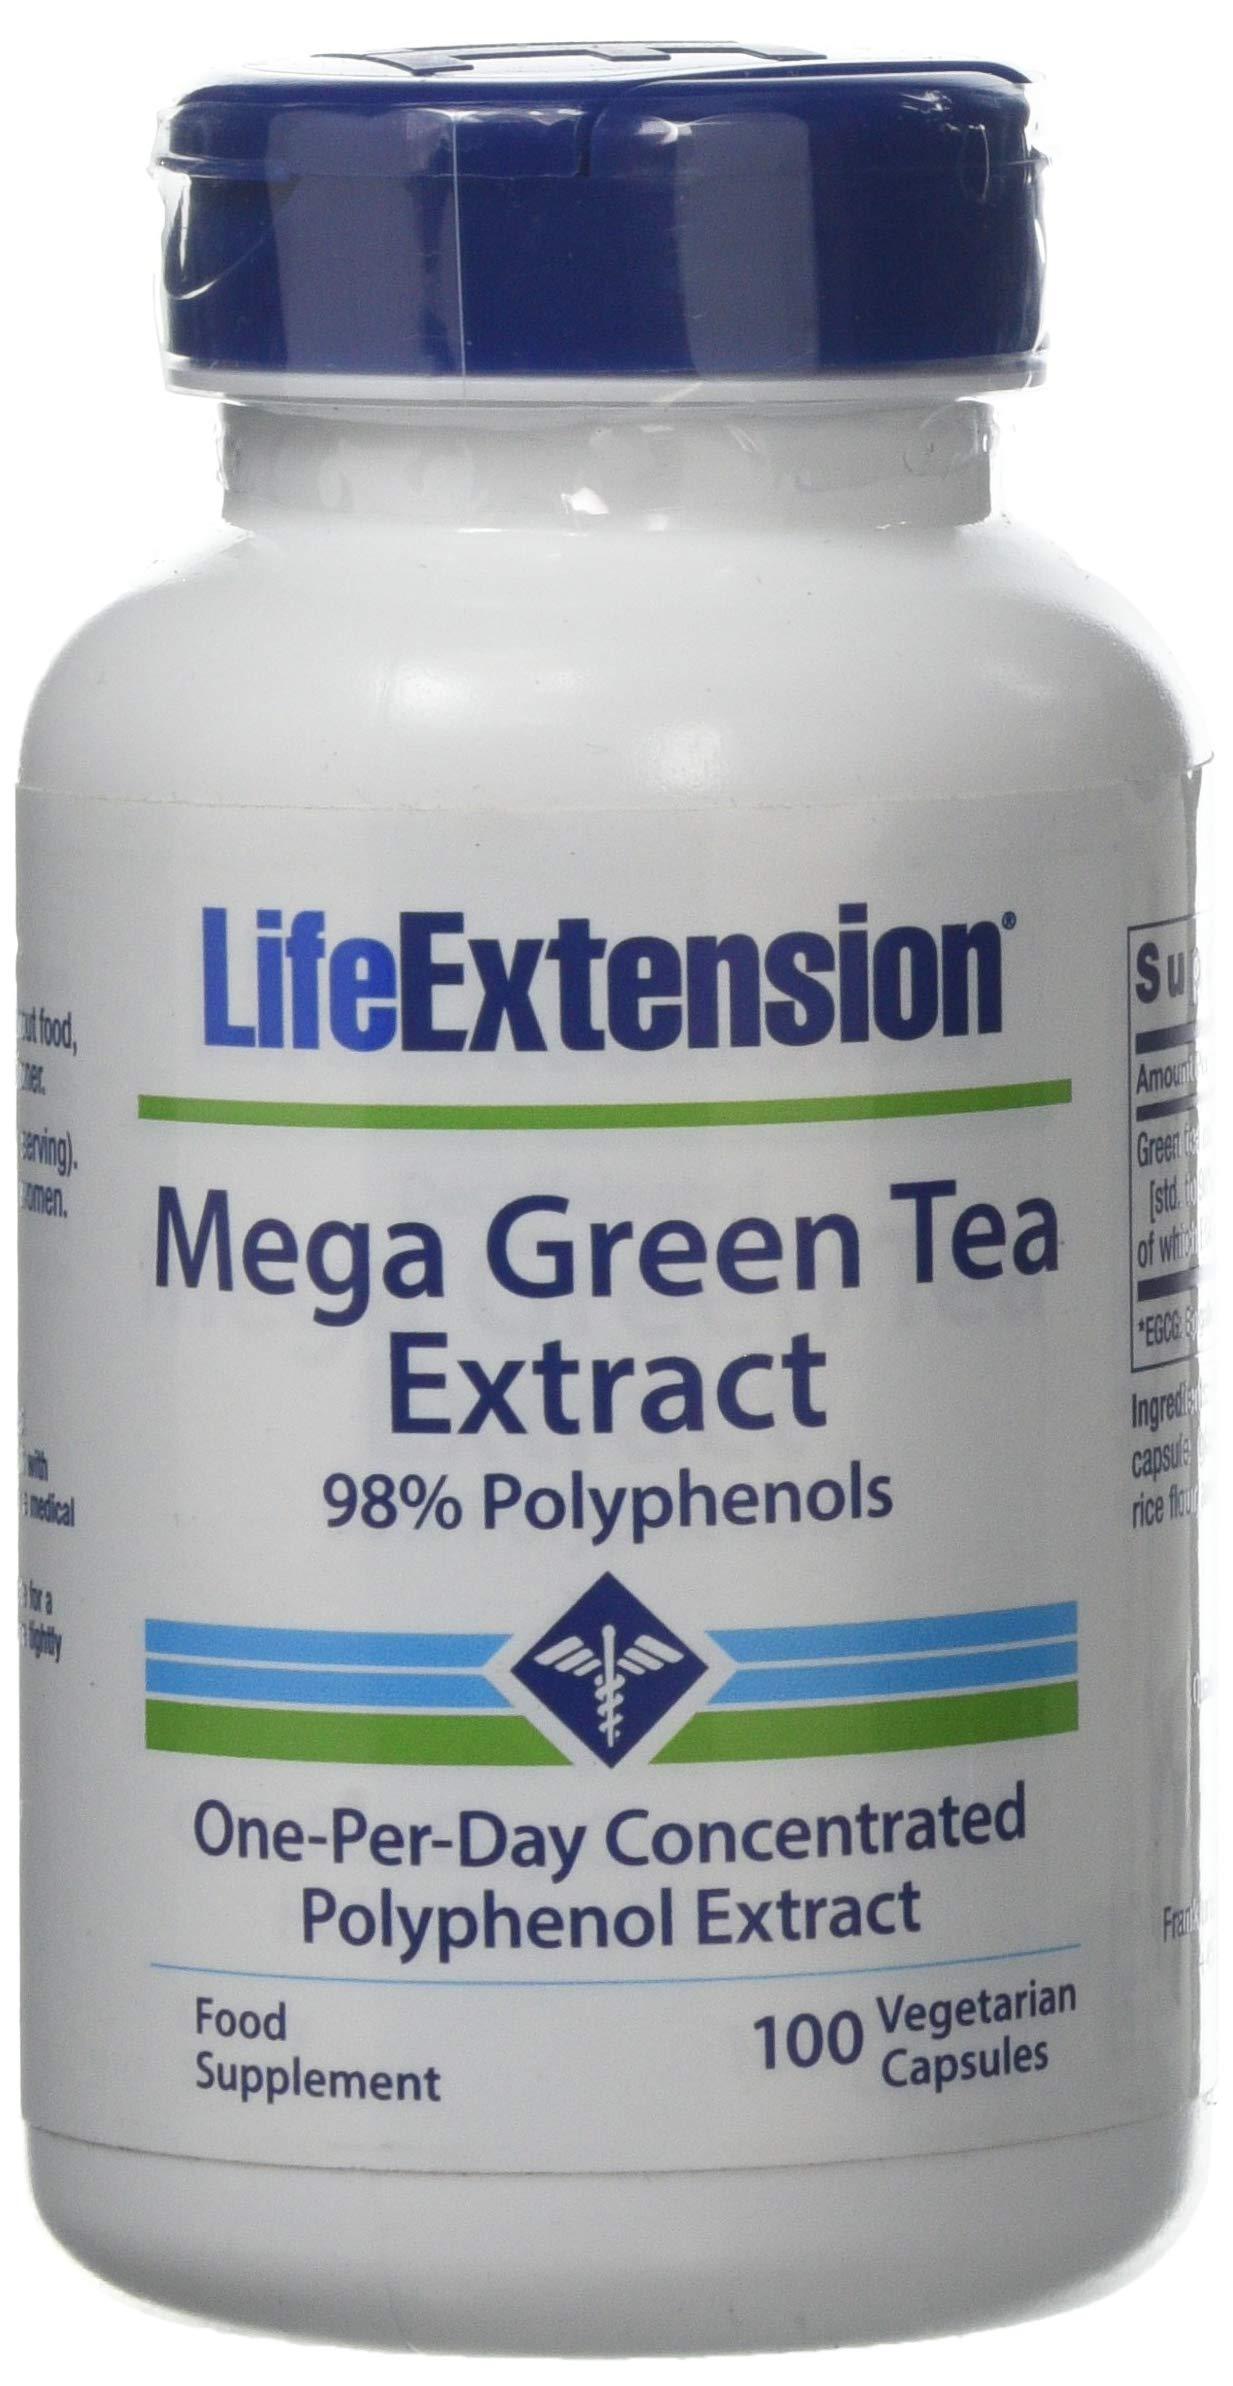 Life Extension Mega Green Tea Extract (98% Polyphenols) Decaffeinated, 100 Vegetarian Capsules